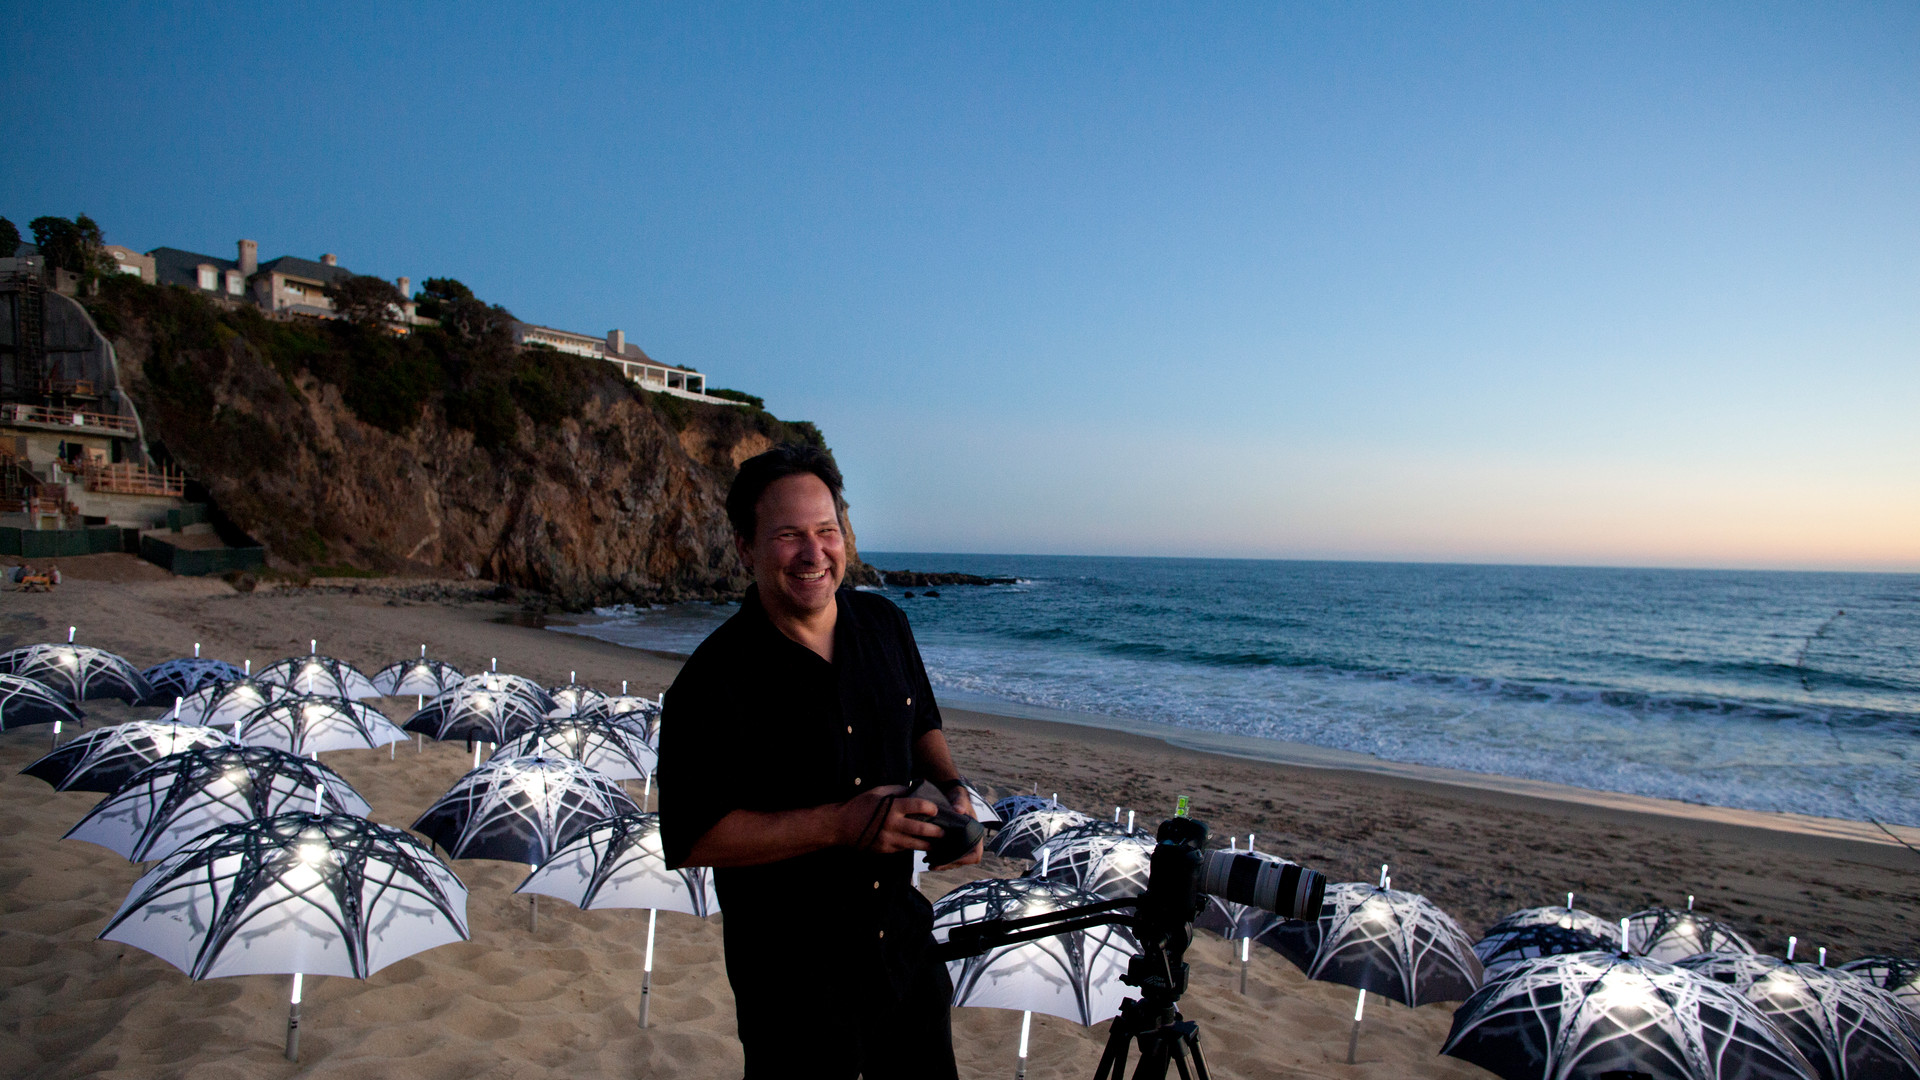 Erik Thienes, Film & Photography